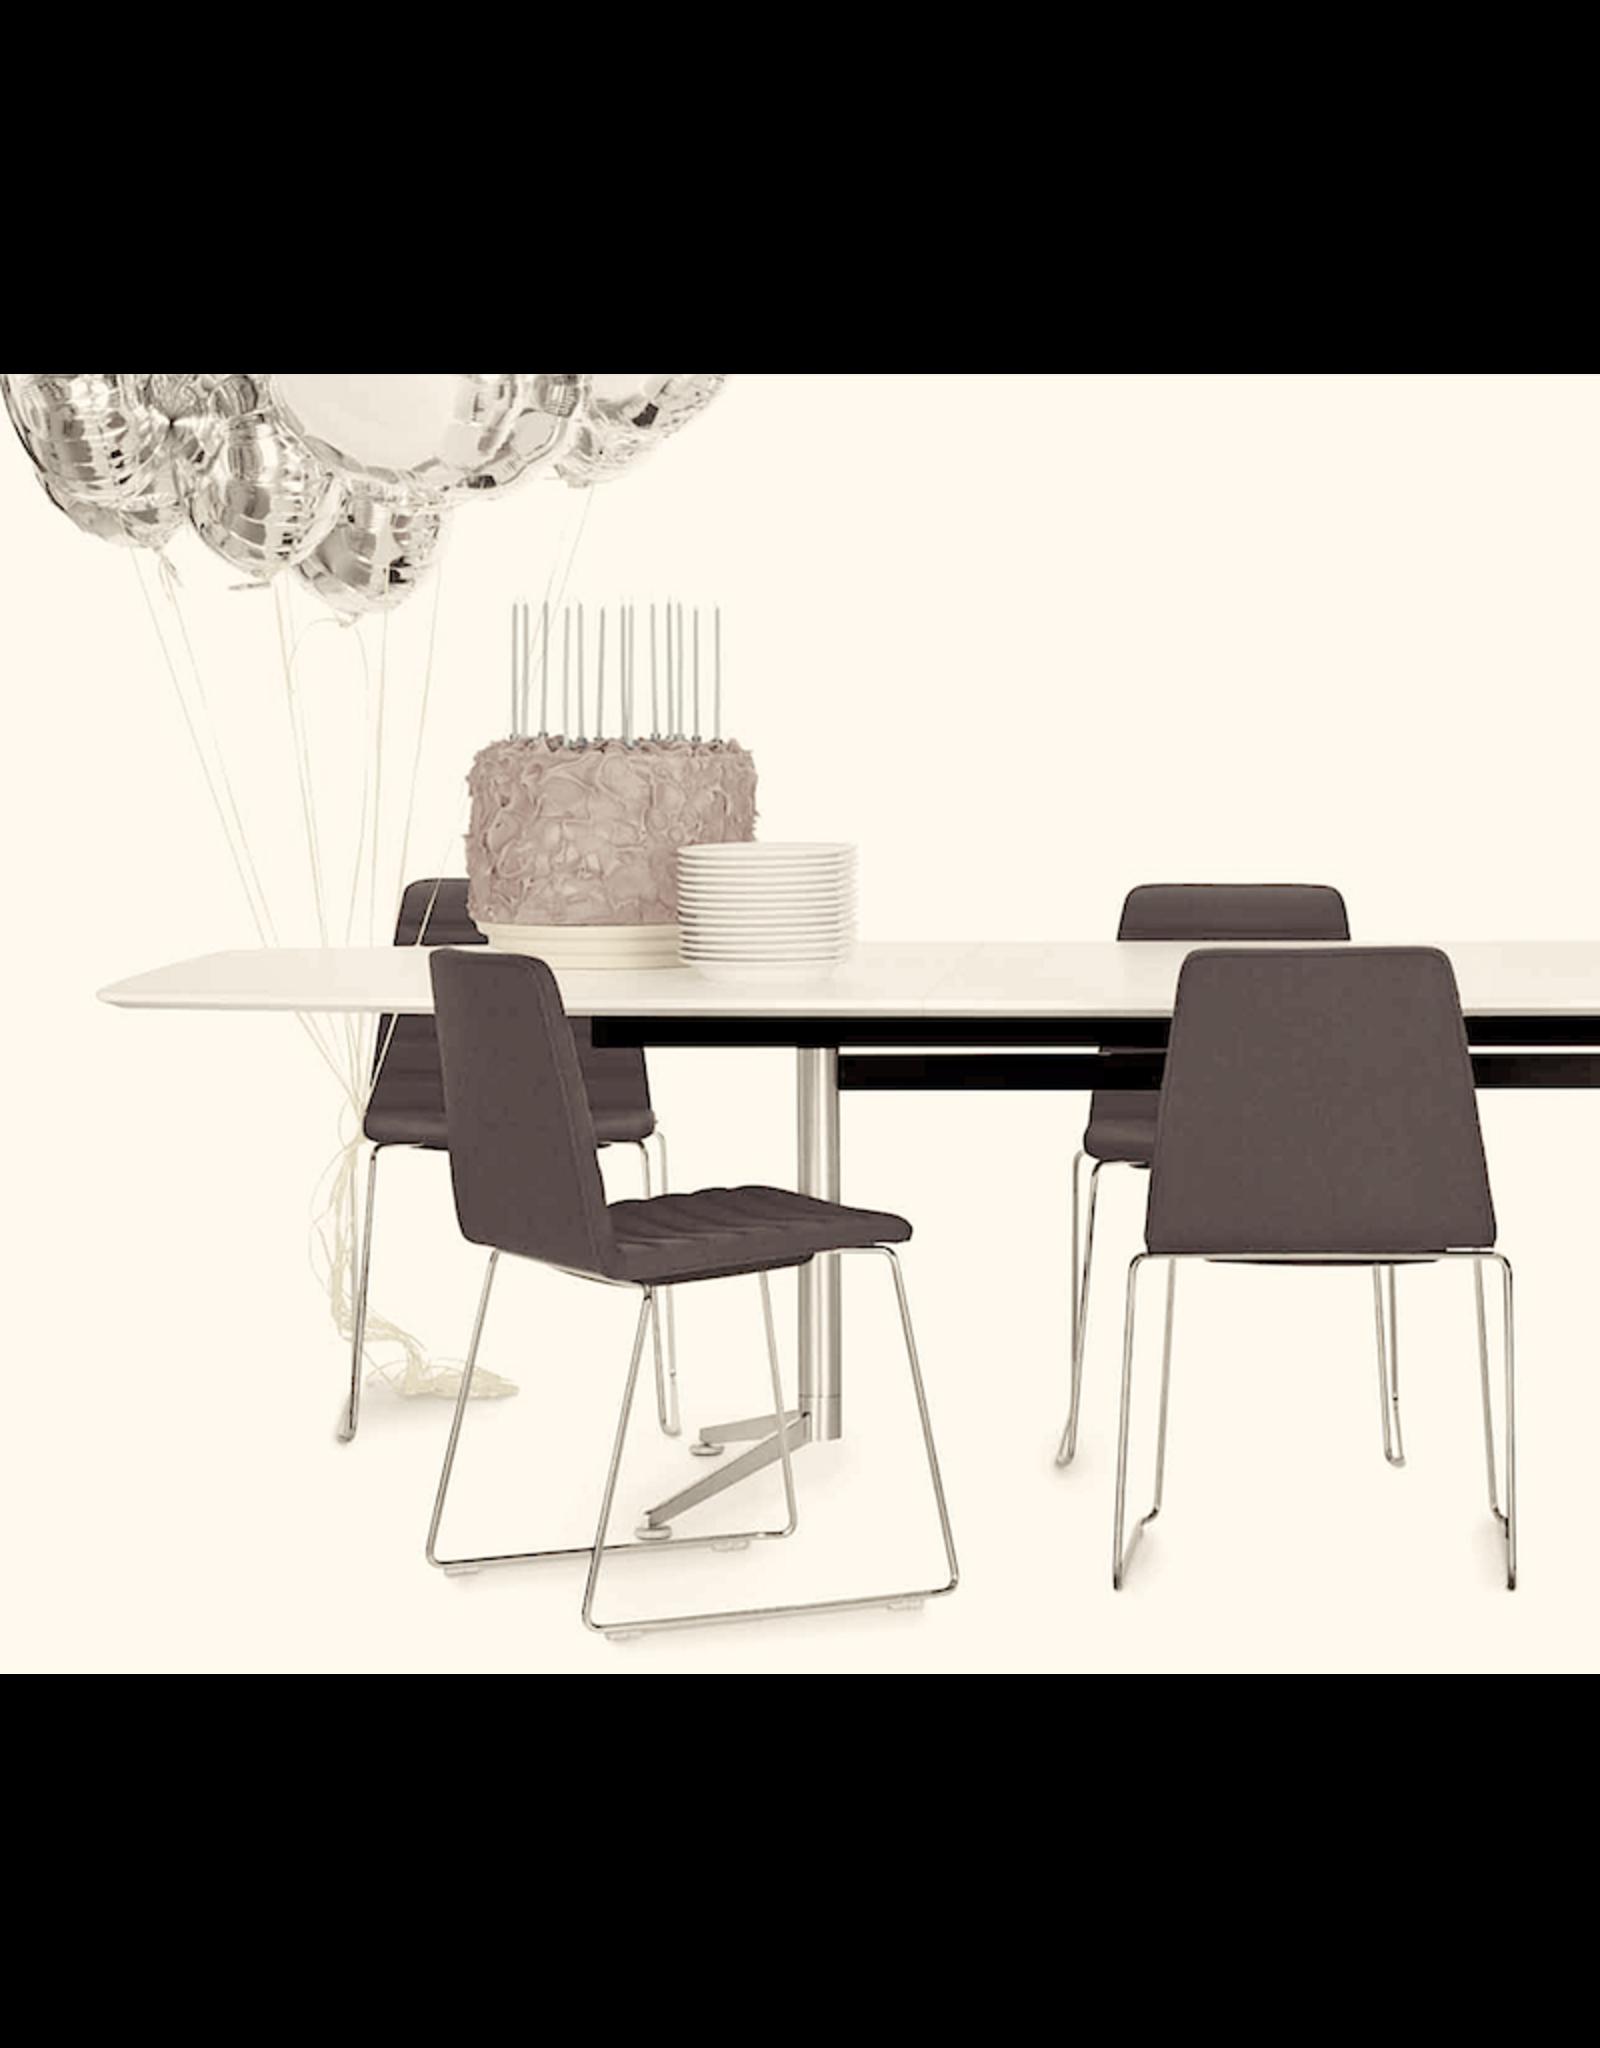 SPINAL CHAIR 44 可叠放镀铬椅子